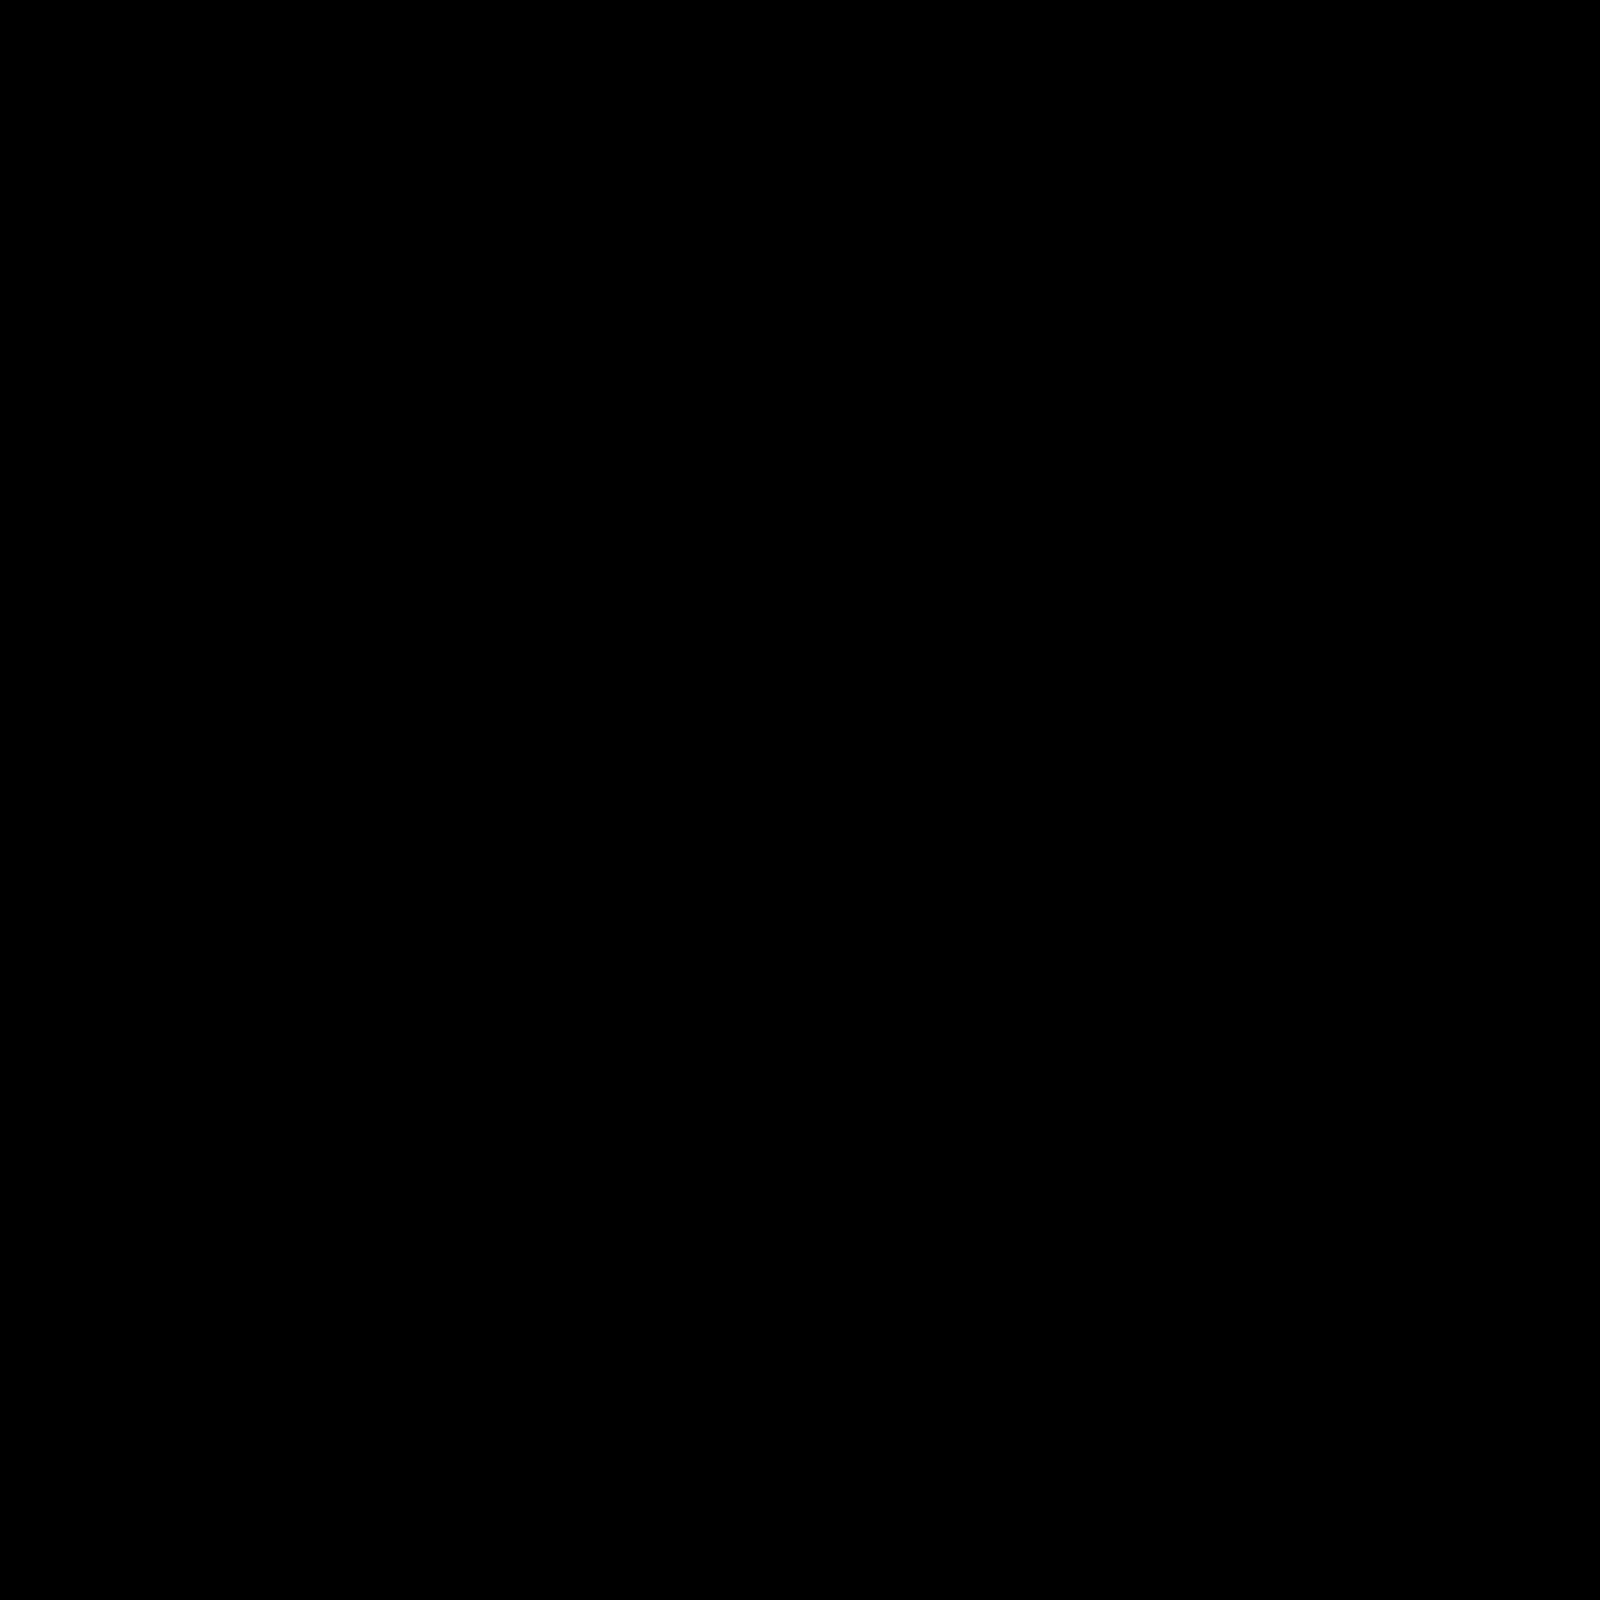 Adjustment icon